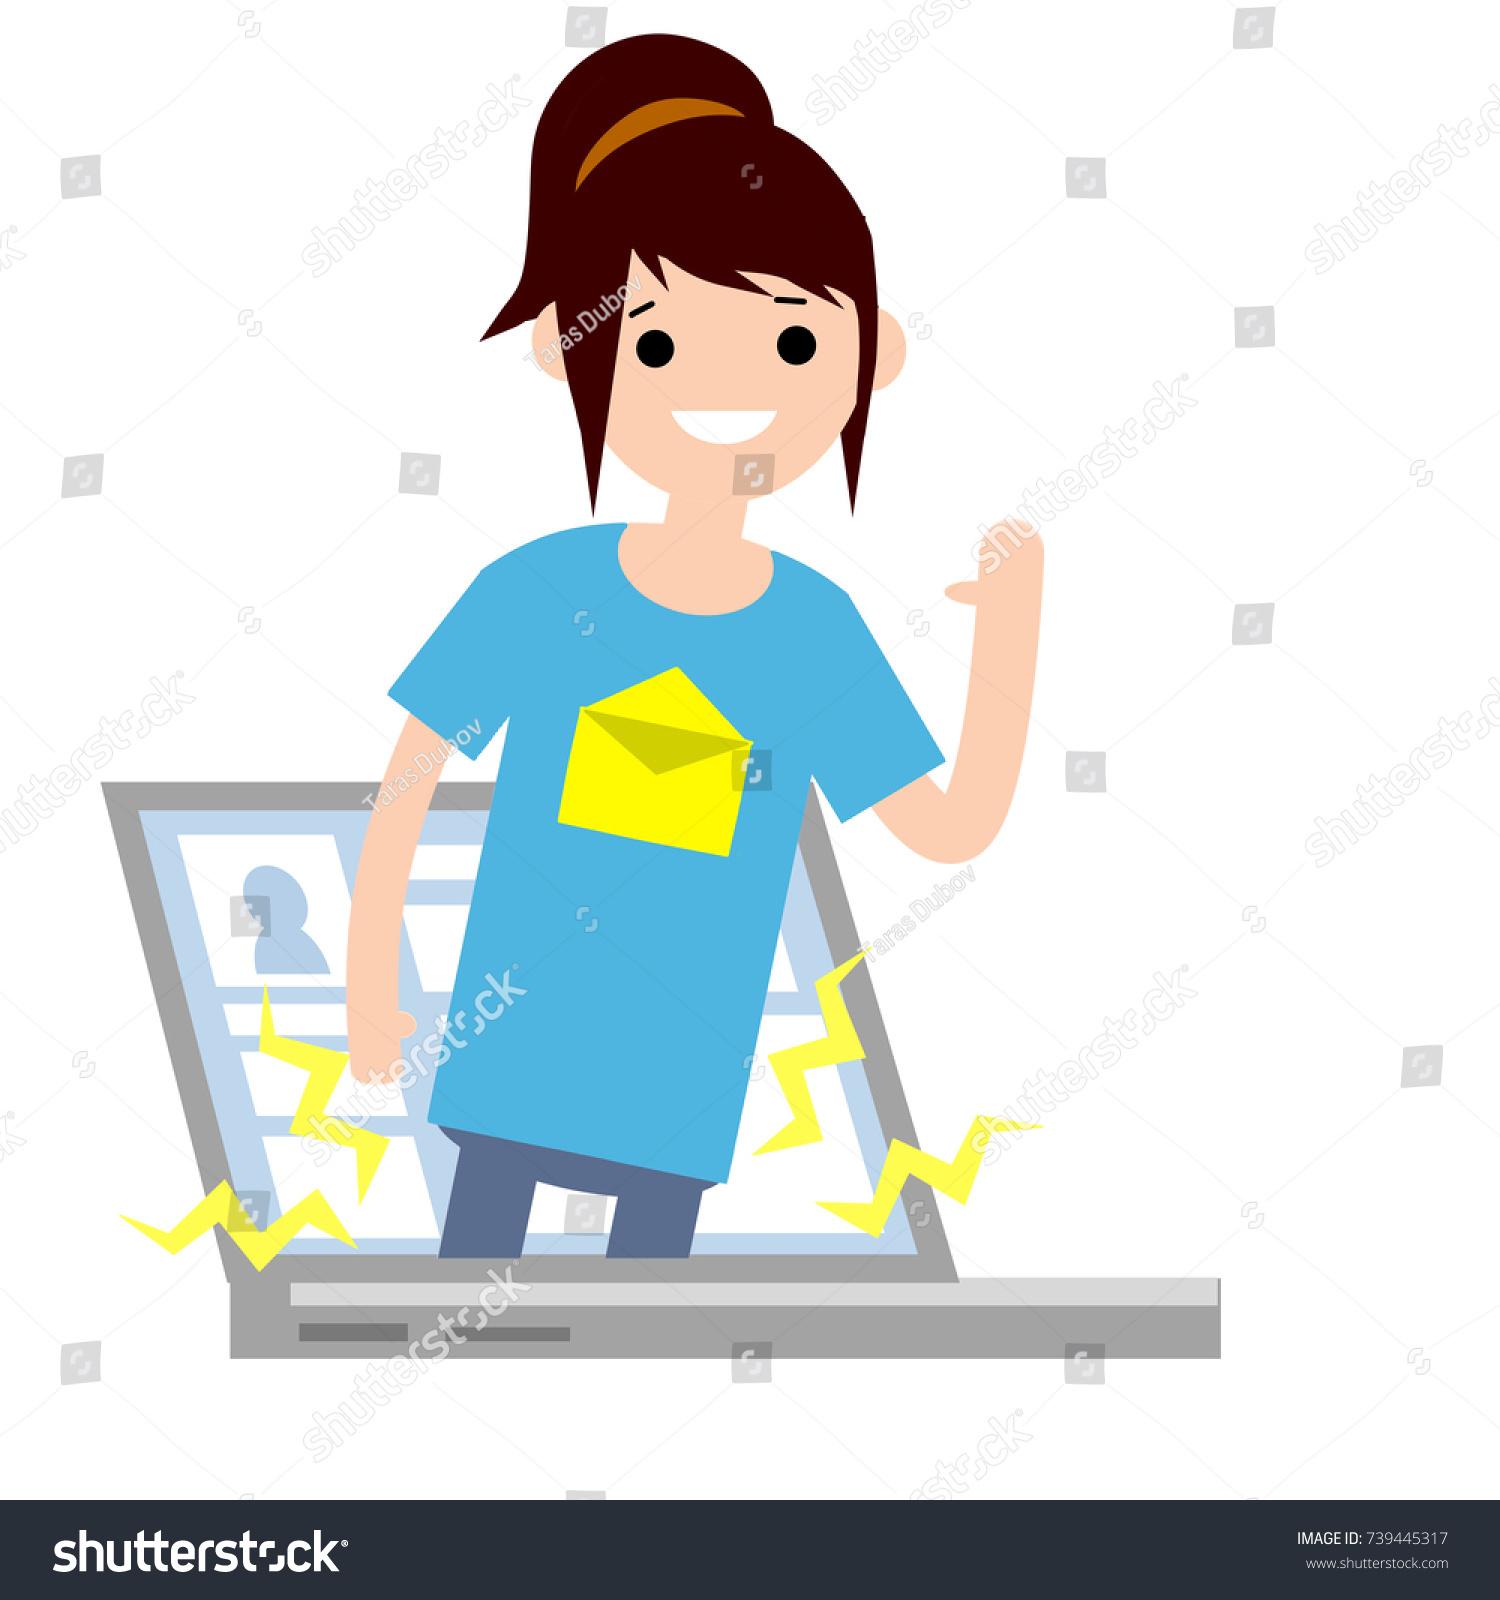 cartoon flat illustration girl ponytail comes stock vector hd rh shutterstock com Music Notes Graphics Music Note Clip Art